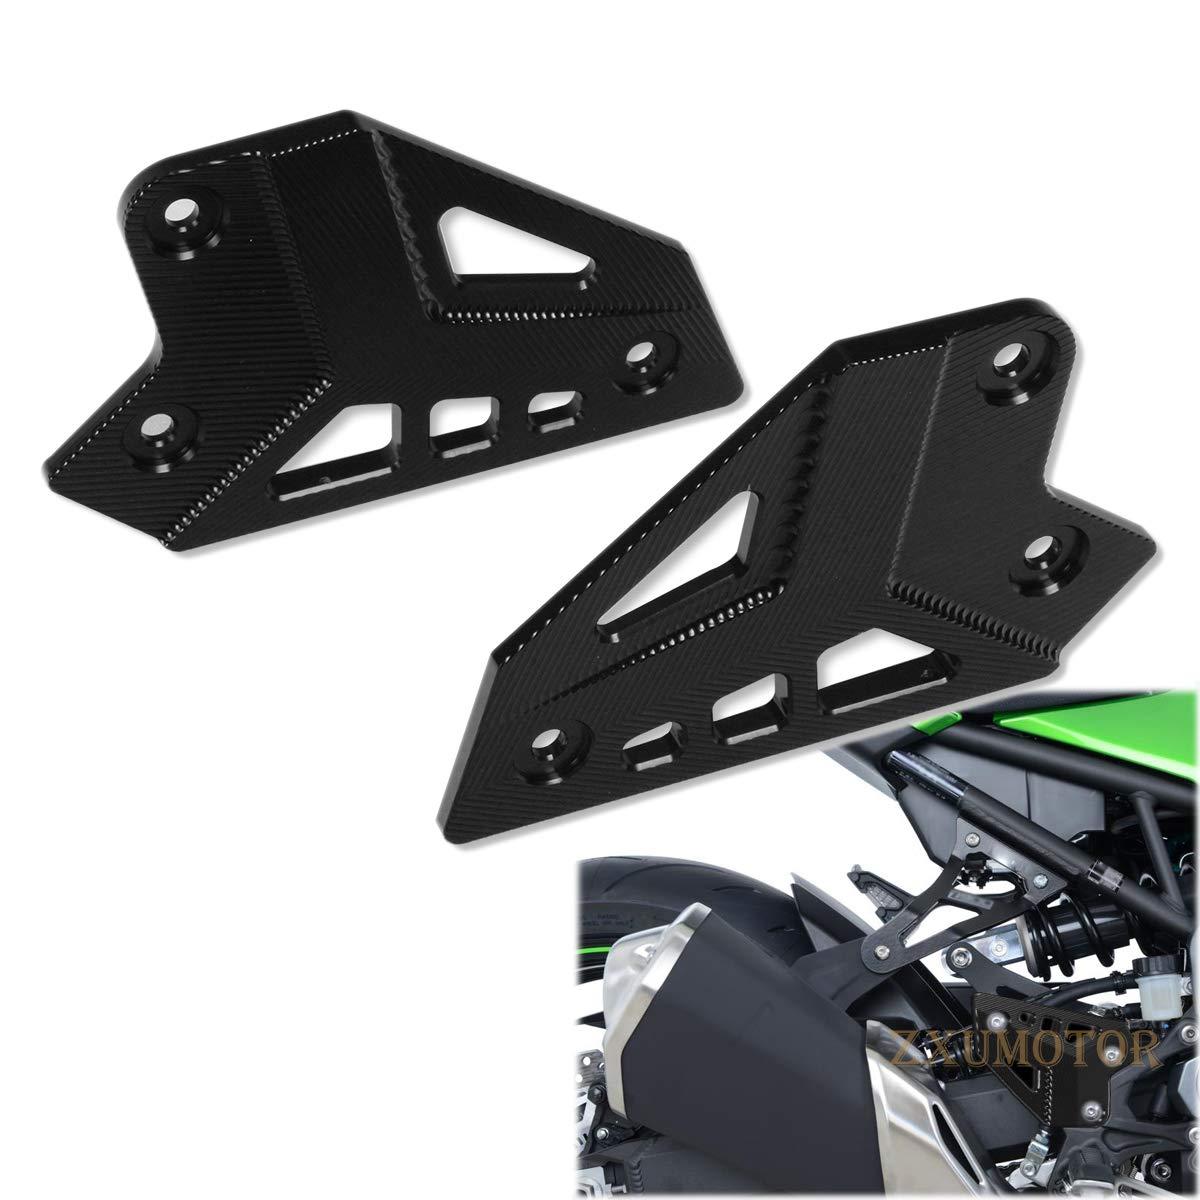 ZAIXU Motorcycle Accessories CNC Aluminum Footrest Foot Peg Heel Plates Protection Frame Guard Protector For Kawasaki Z900 2017 Blue